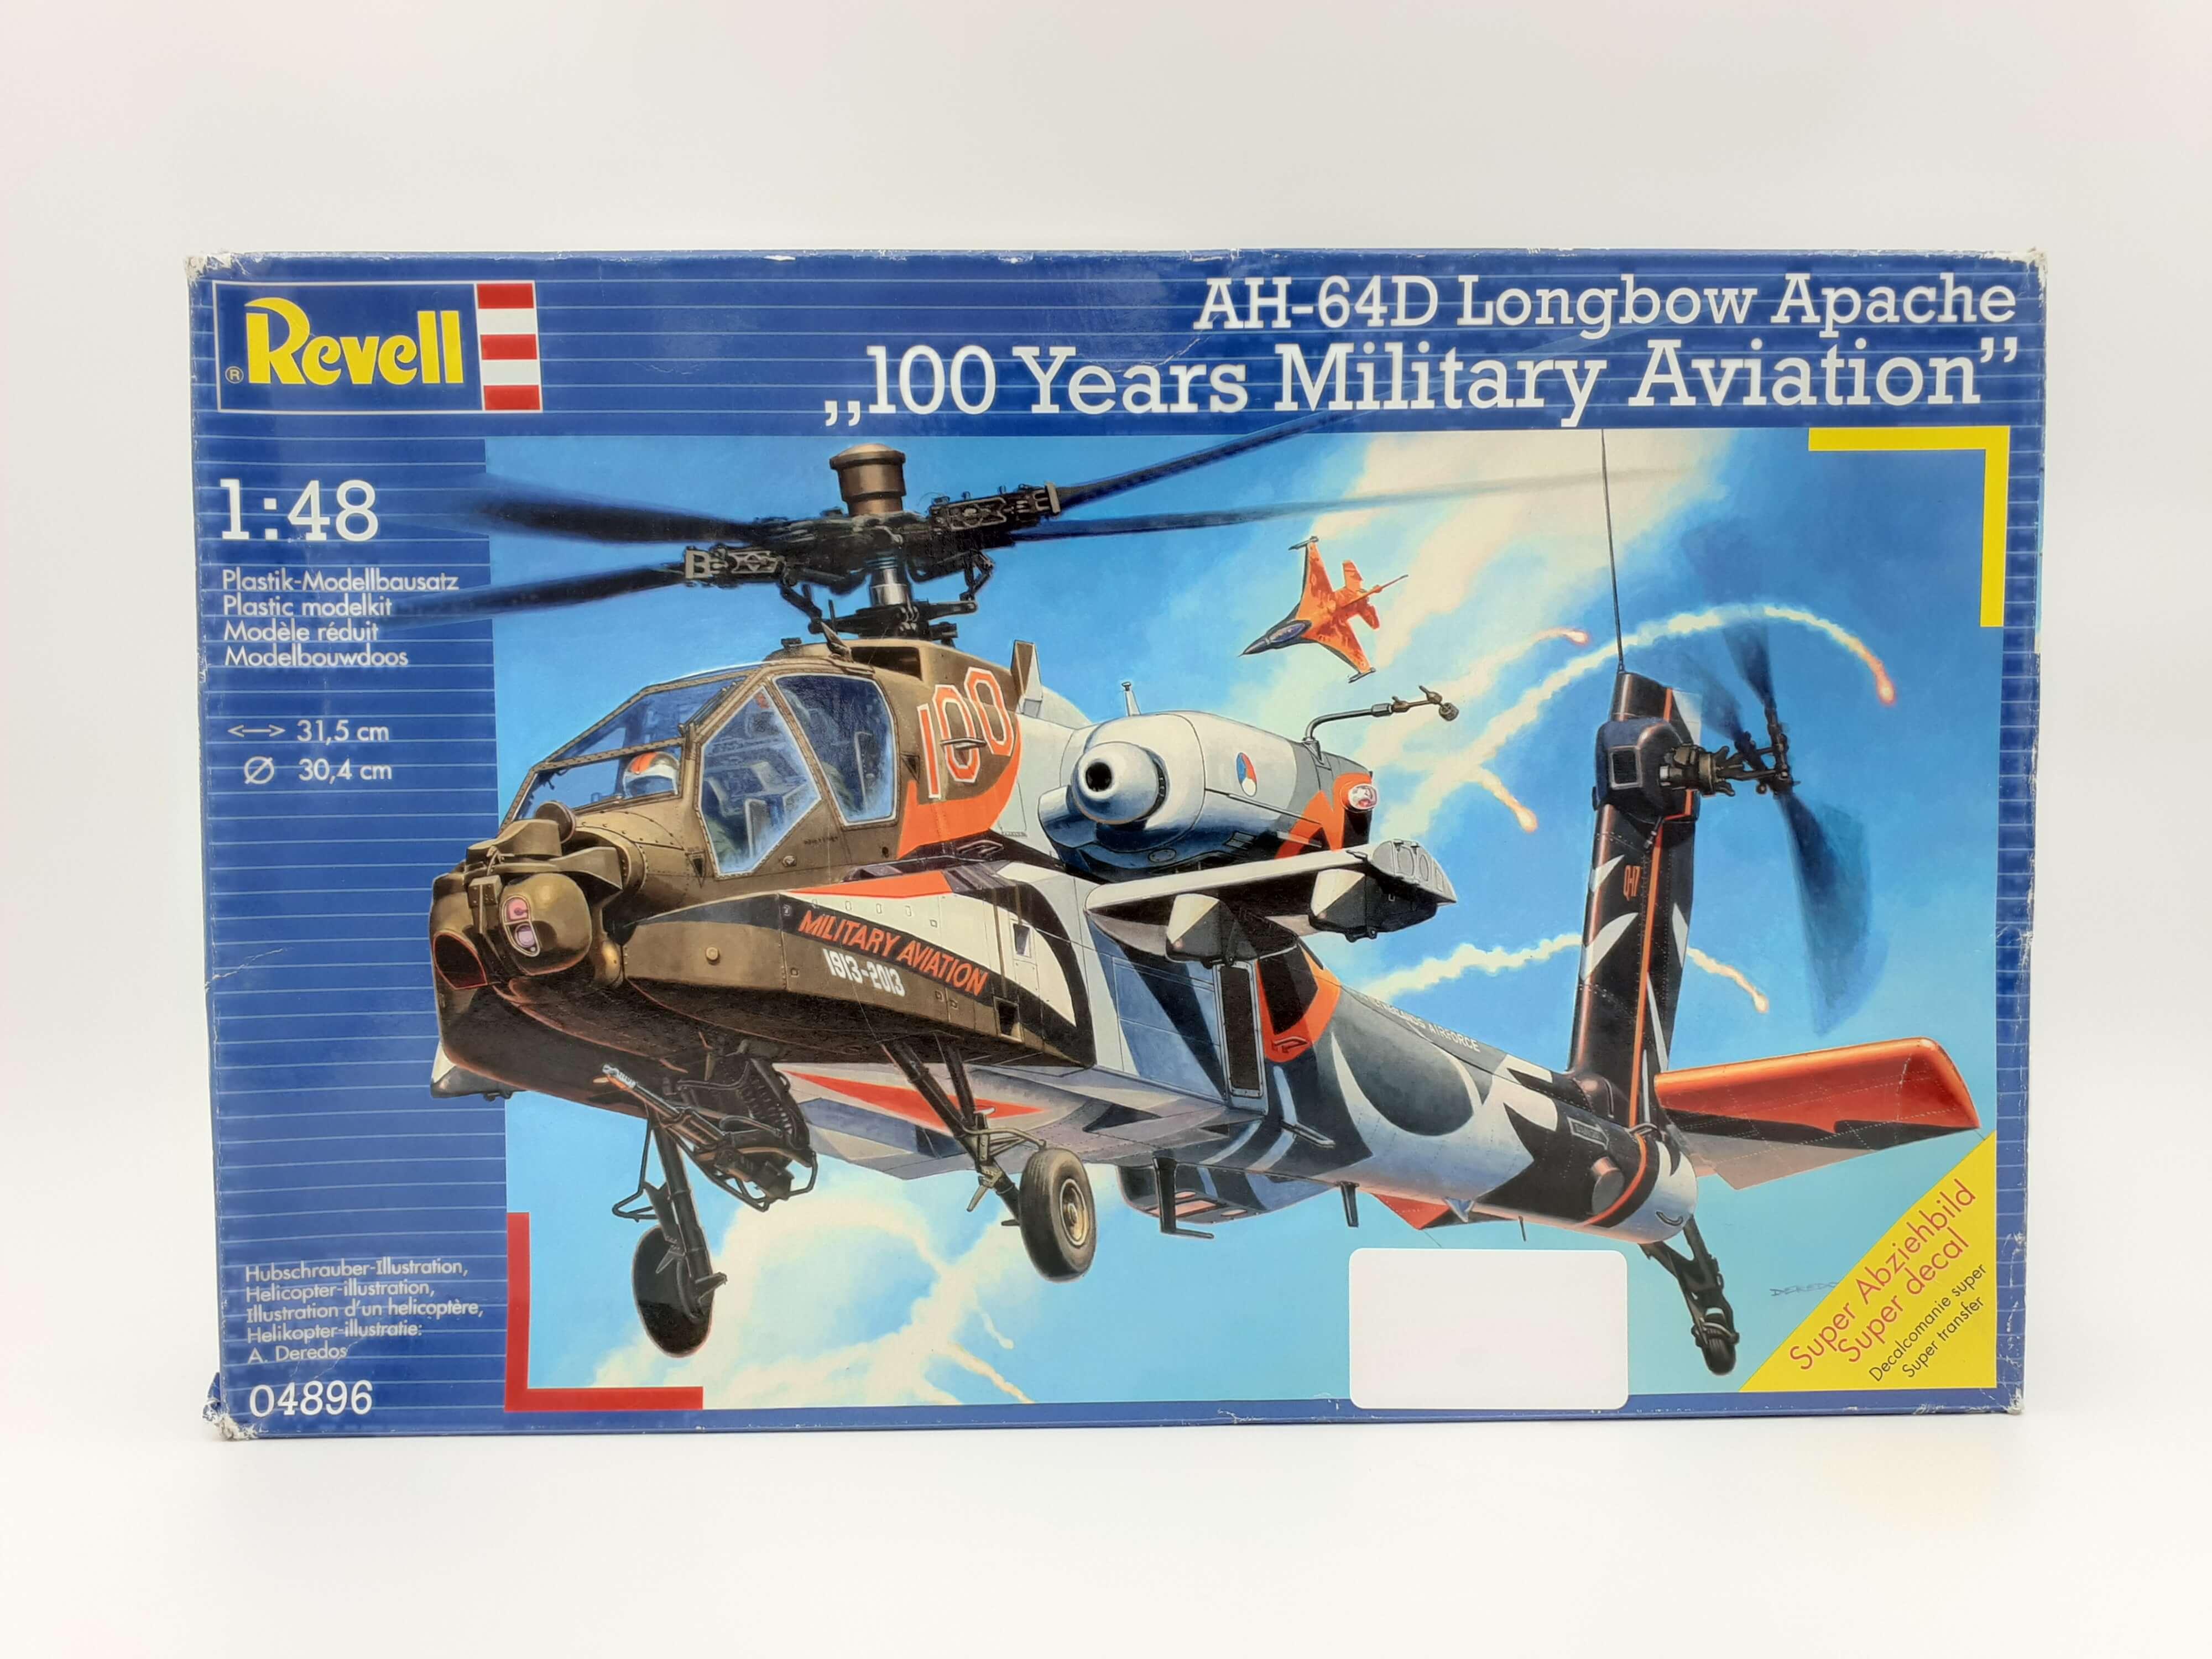 Revell maketa AH-64D Longbow Apache 100 years military aviation 1:48 - oštećeno pakovanje